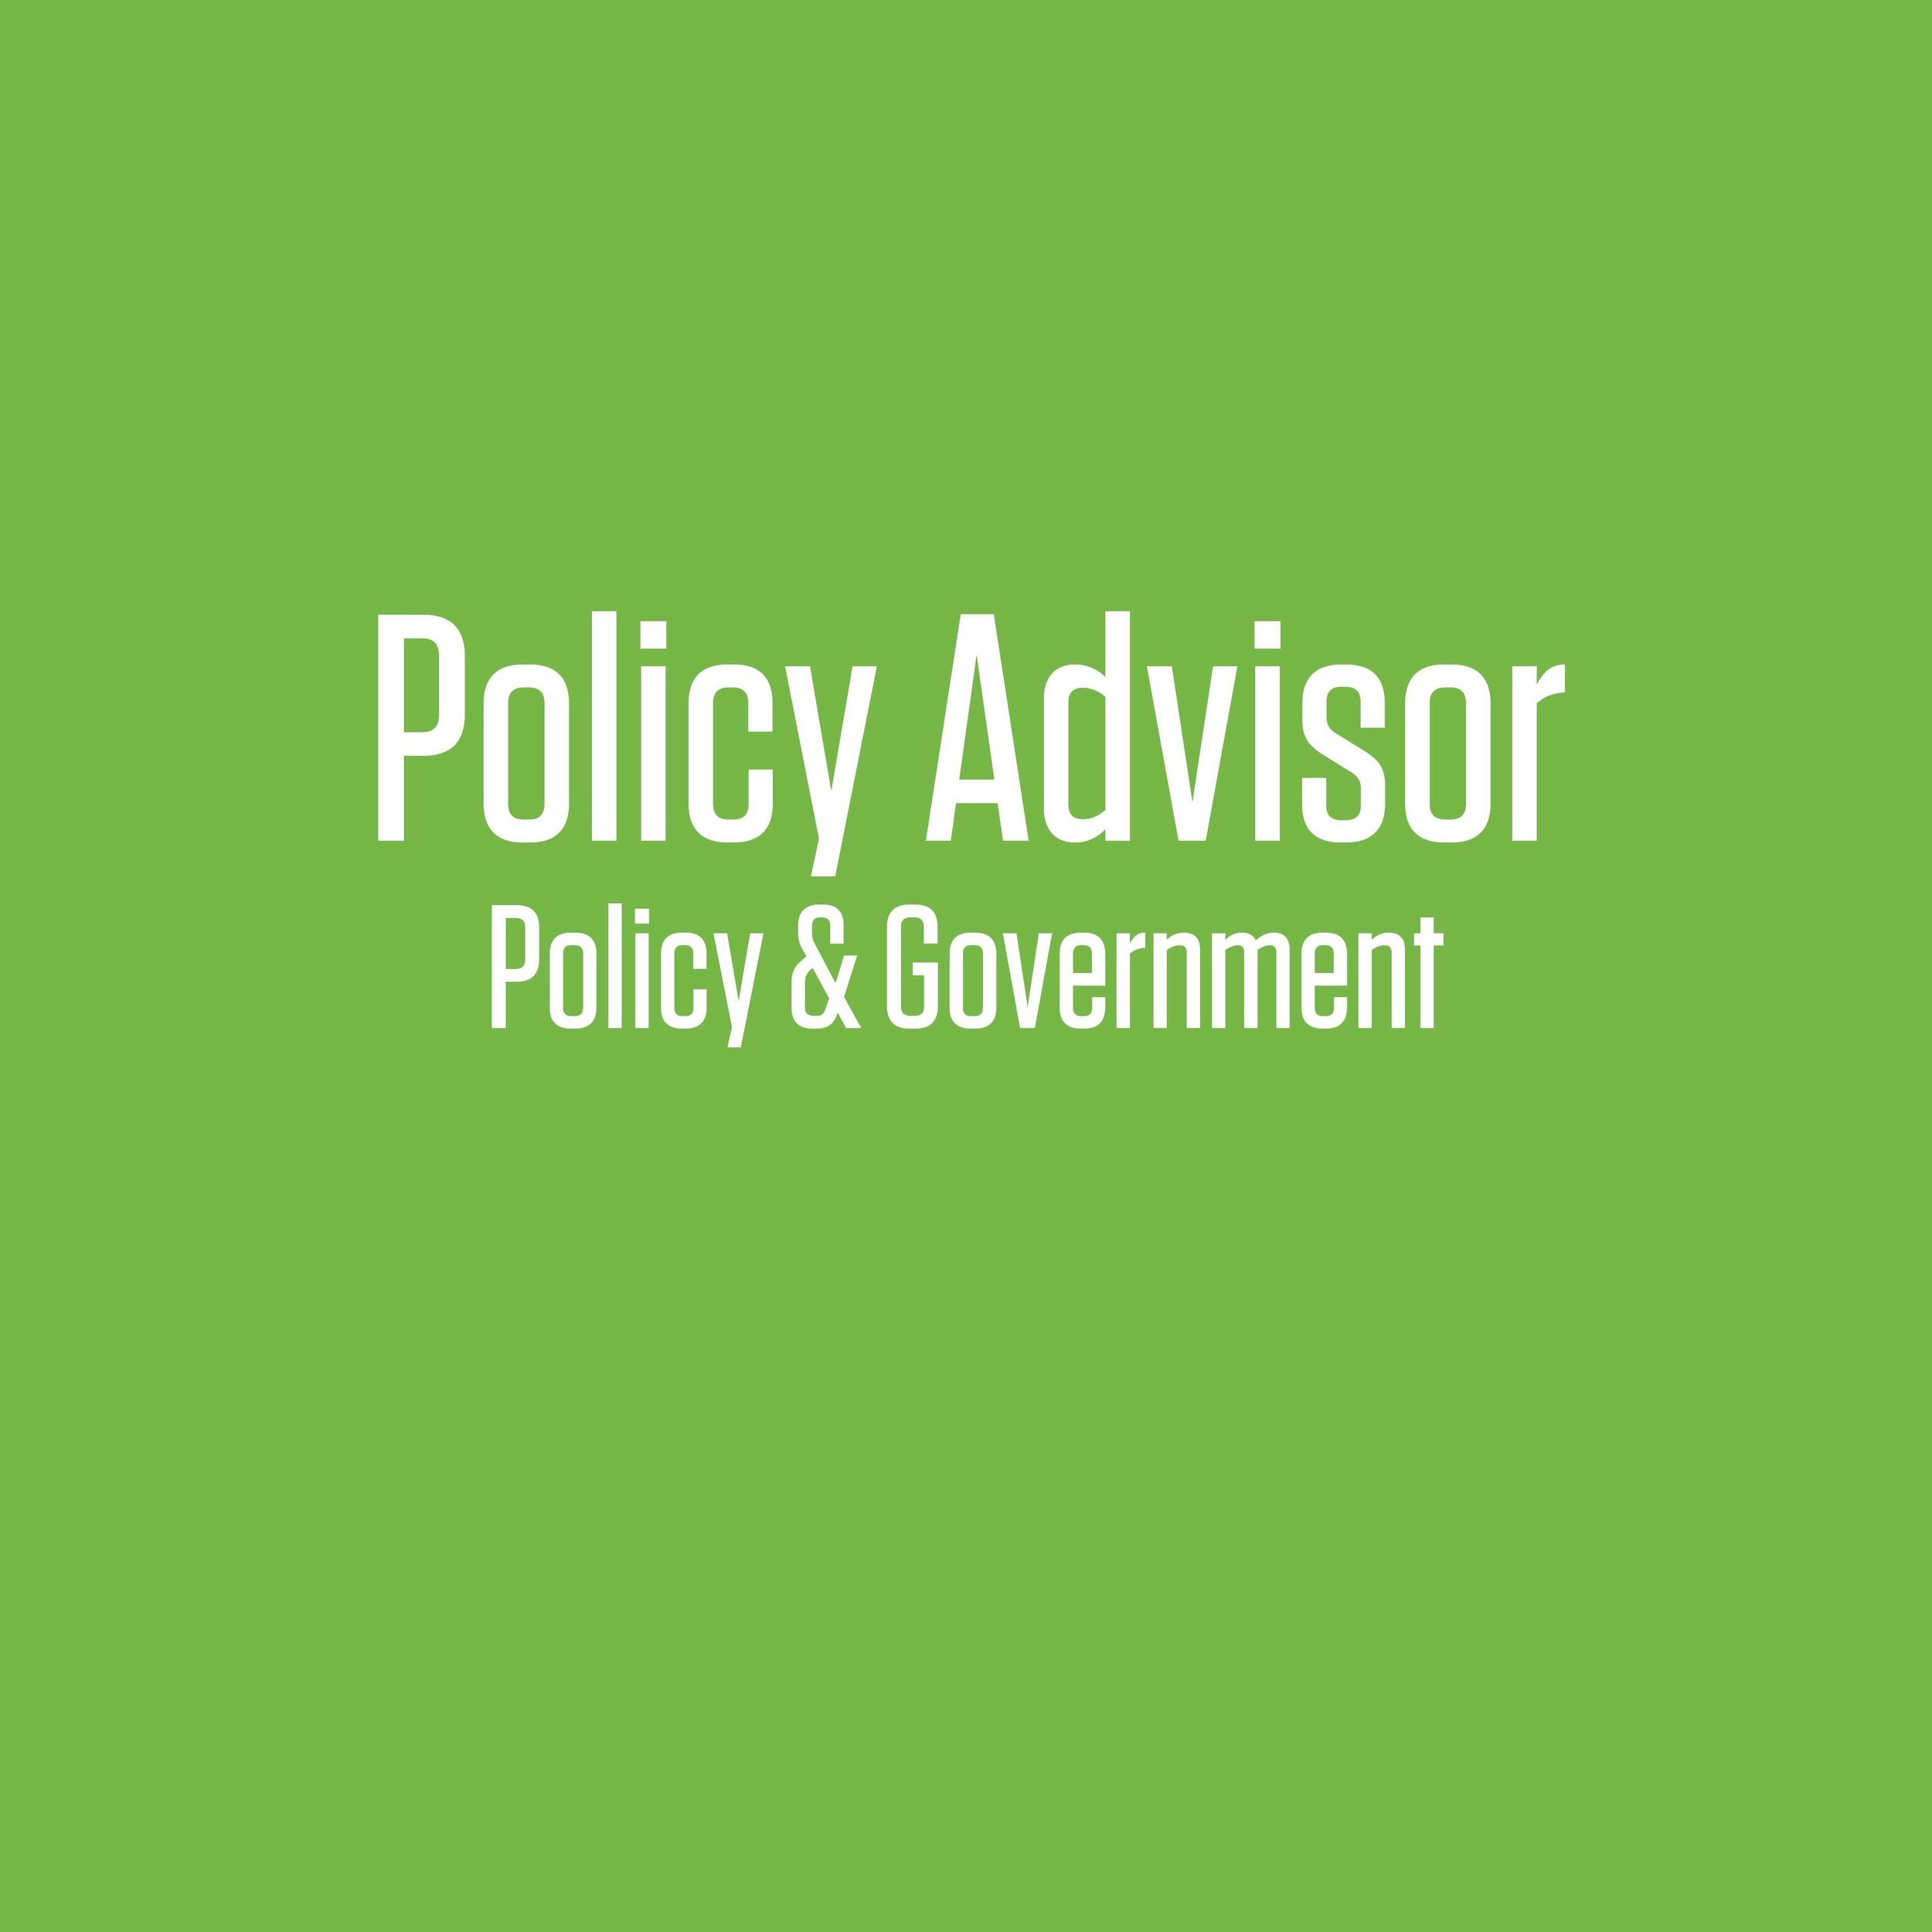 policy advisor.jpg